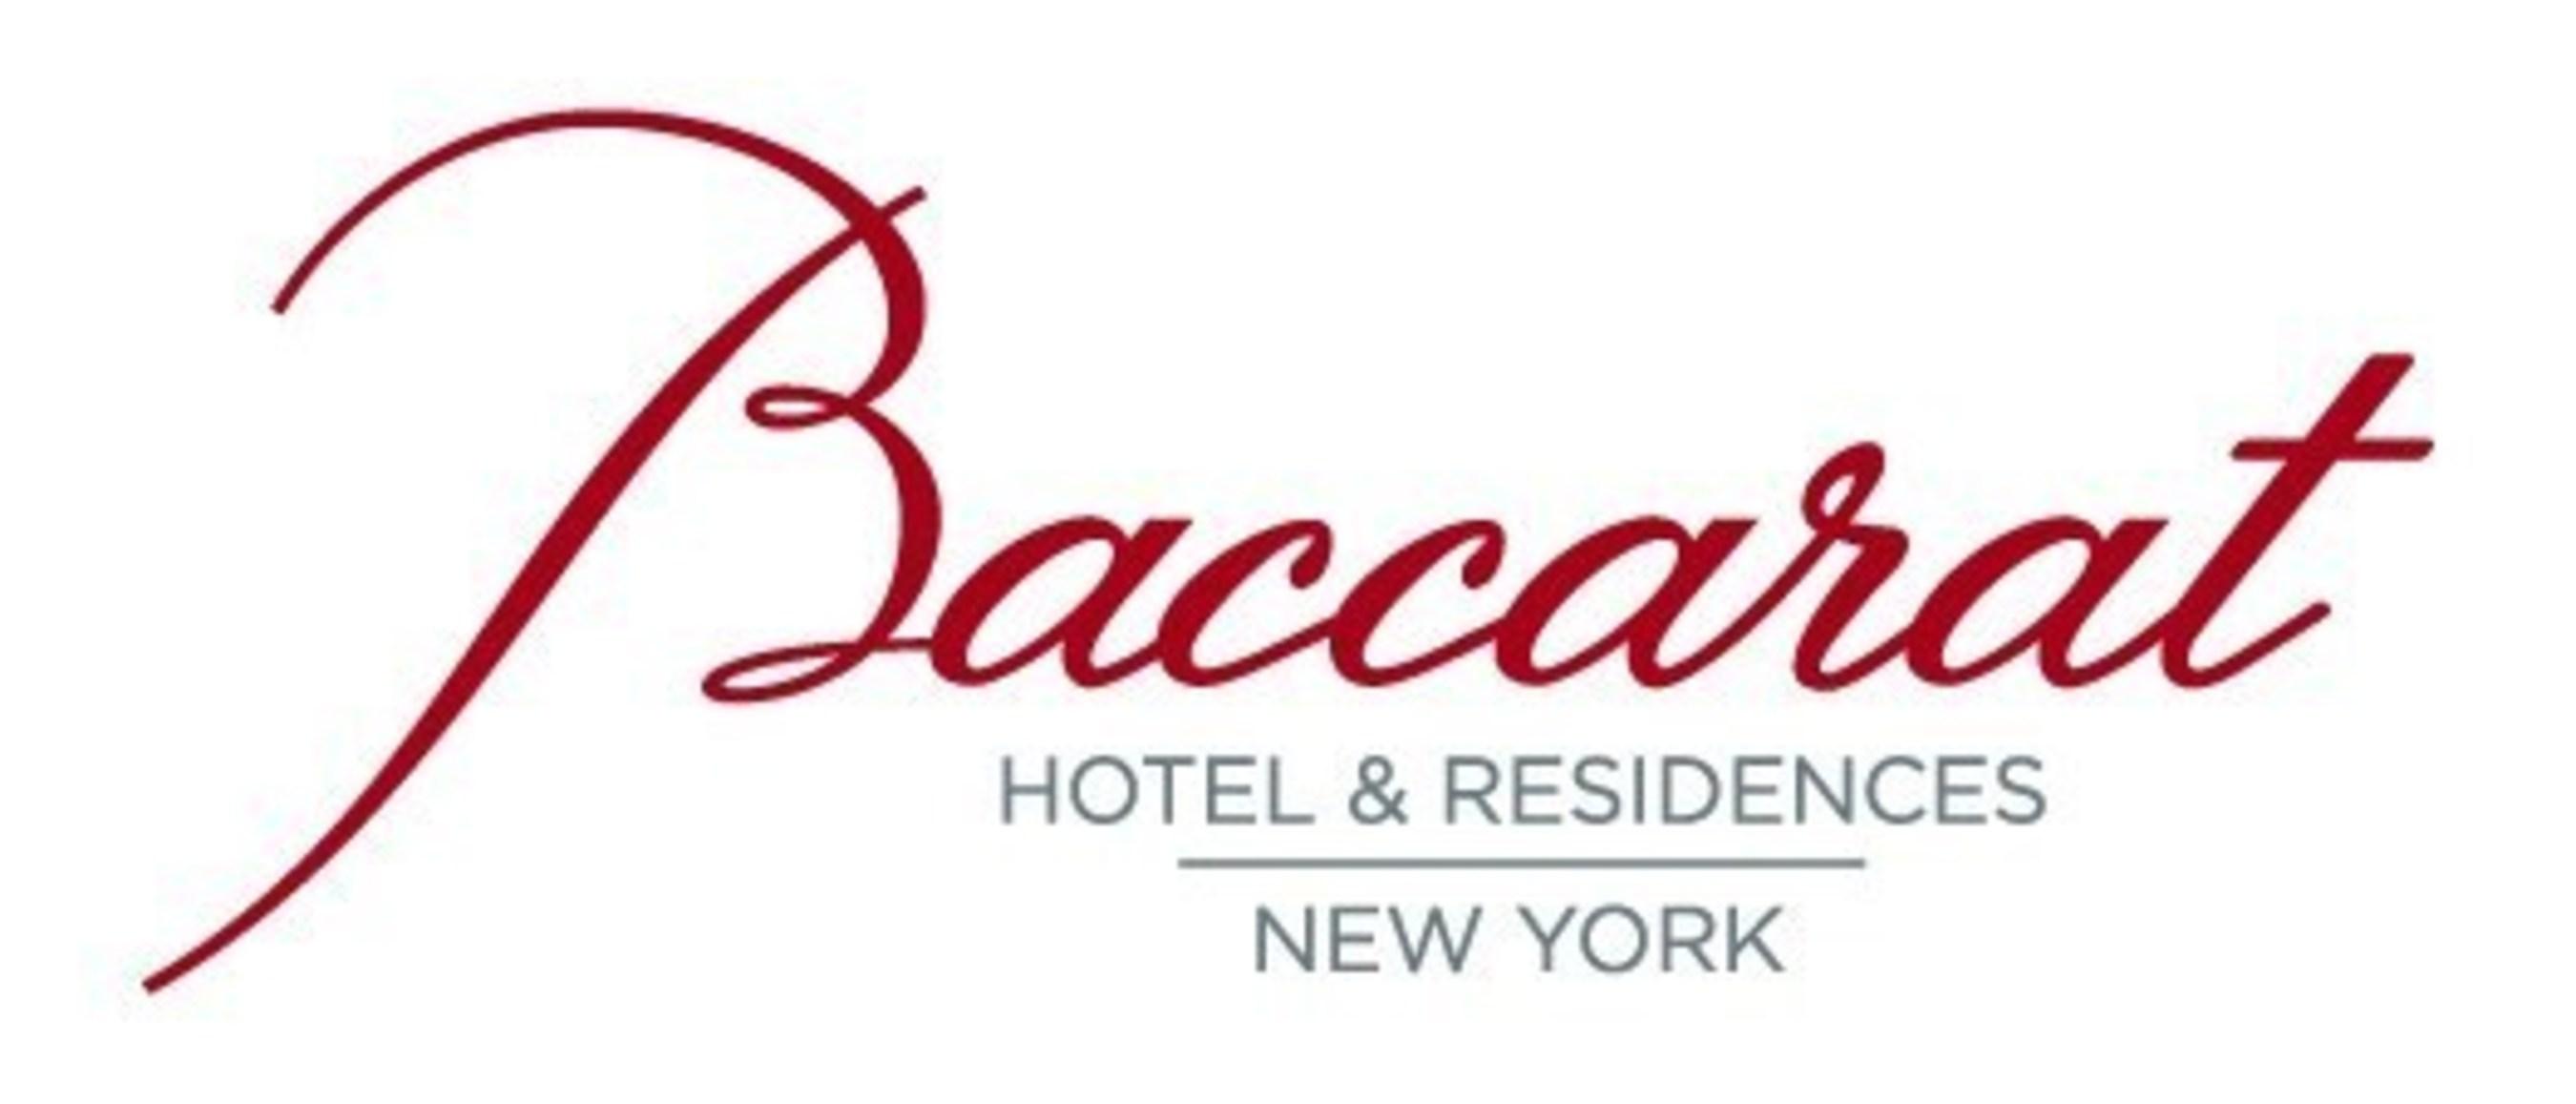 Baccarat Hotel & Residences New York Logo